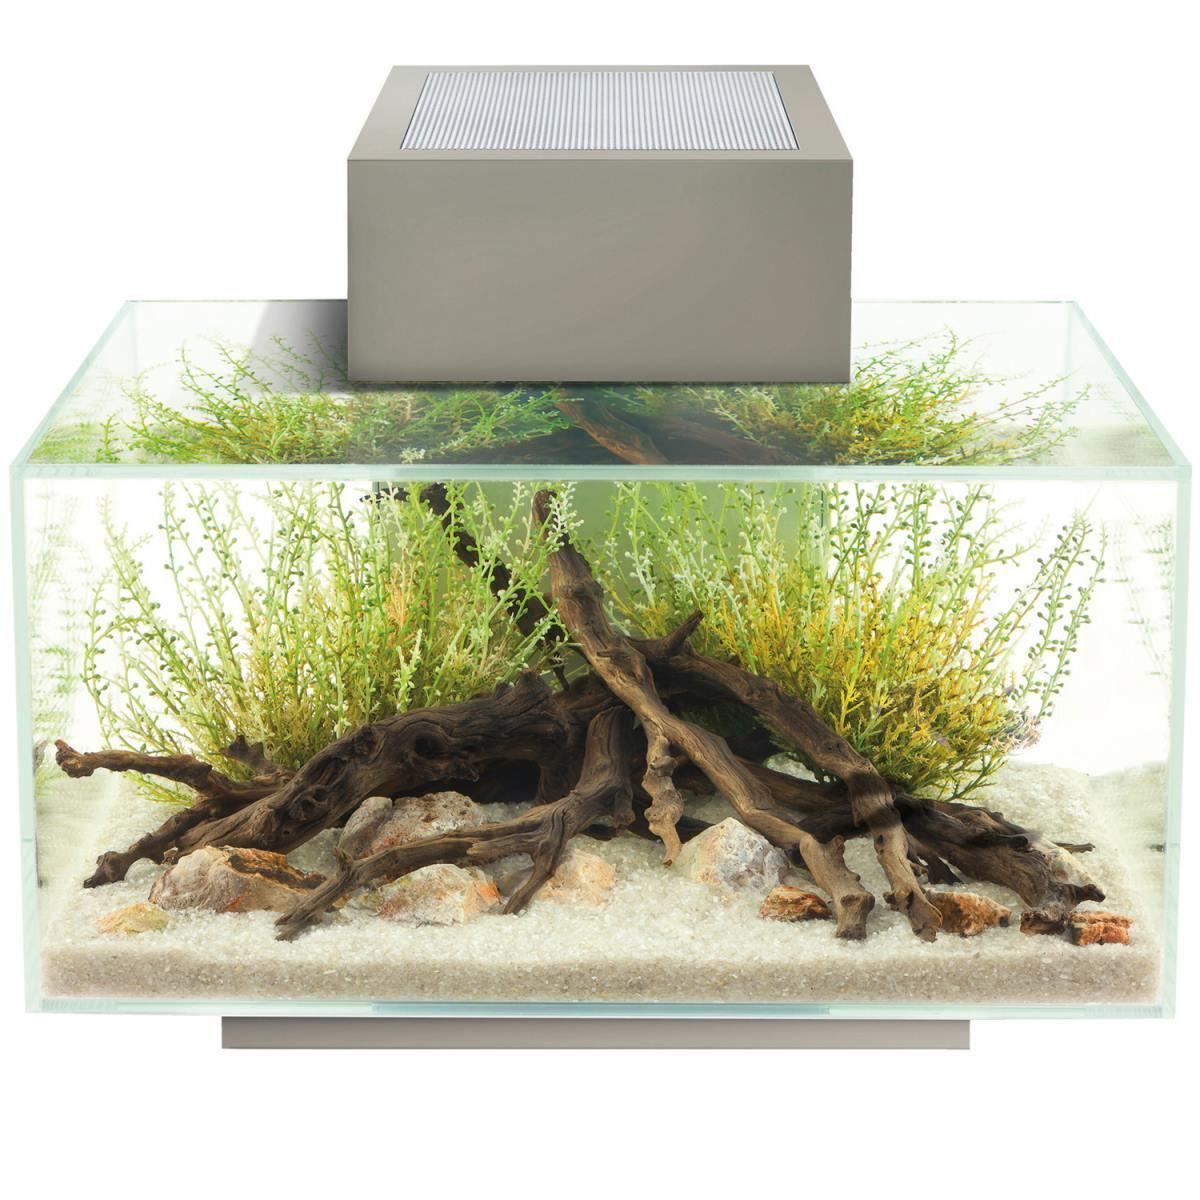 Zinnfarbendes Aquarium Fluval Edge - 23 Liter mit mit mit LED-Beleuchtungssystem 15386 de2783